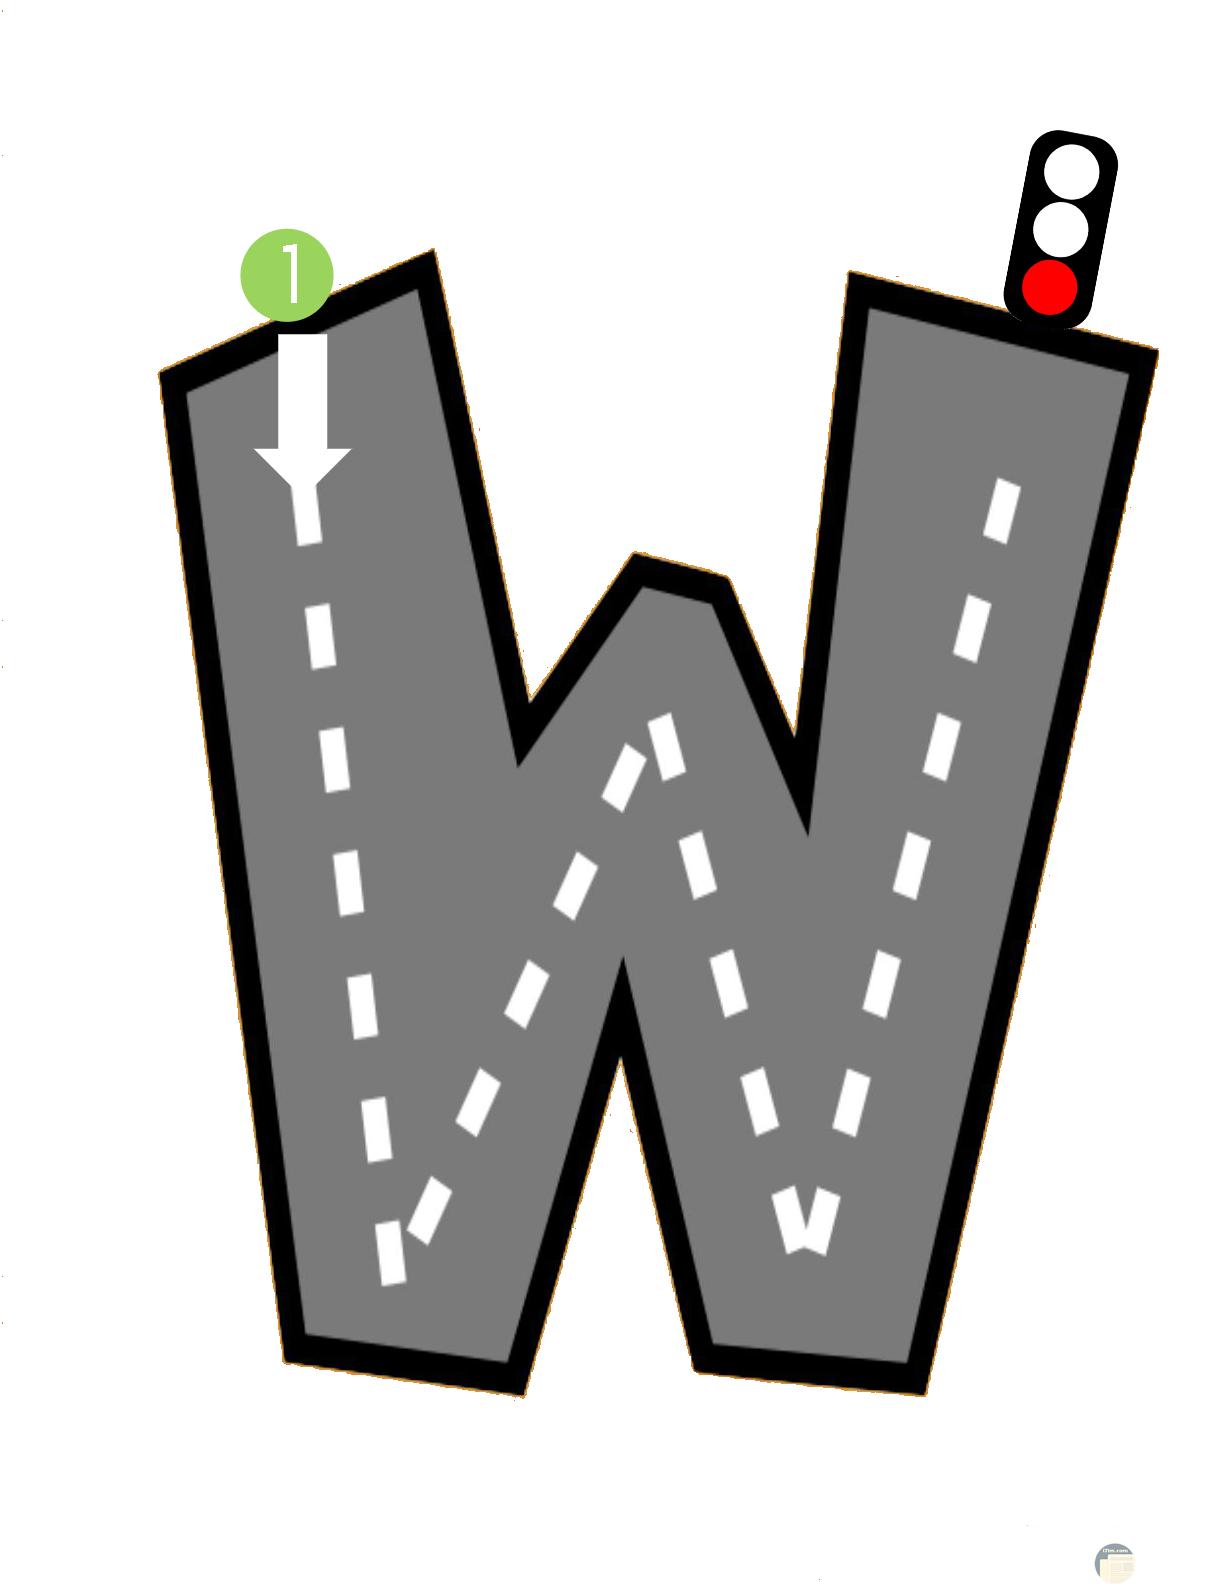 حرف w كأنه طريق.